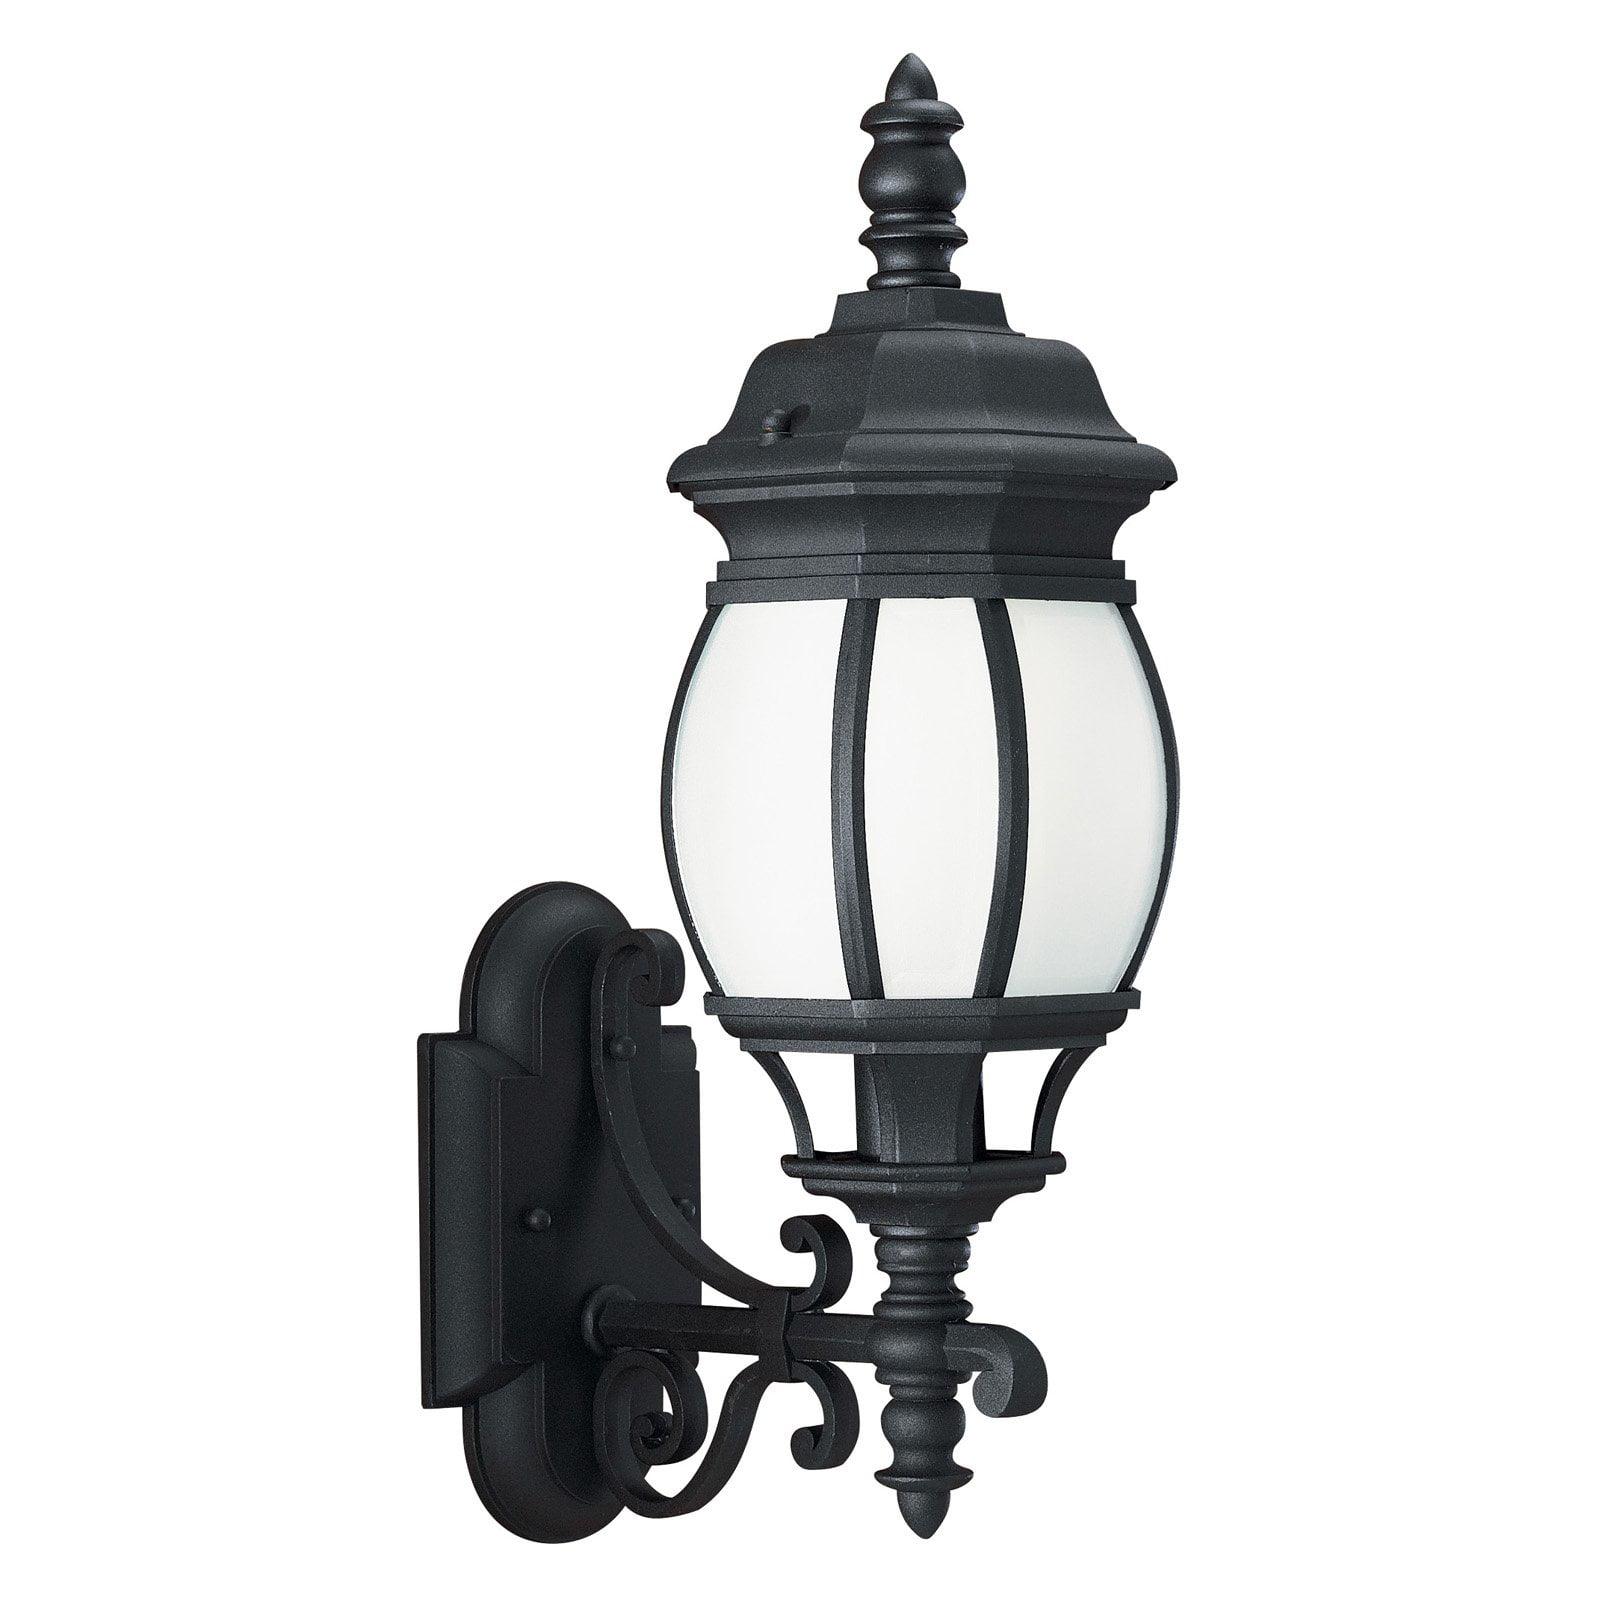 Sea Gull Lighting Wynfield 8910 Outdoor Wall Lantern